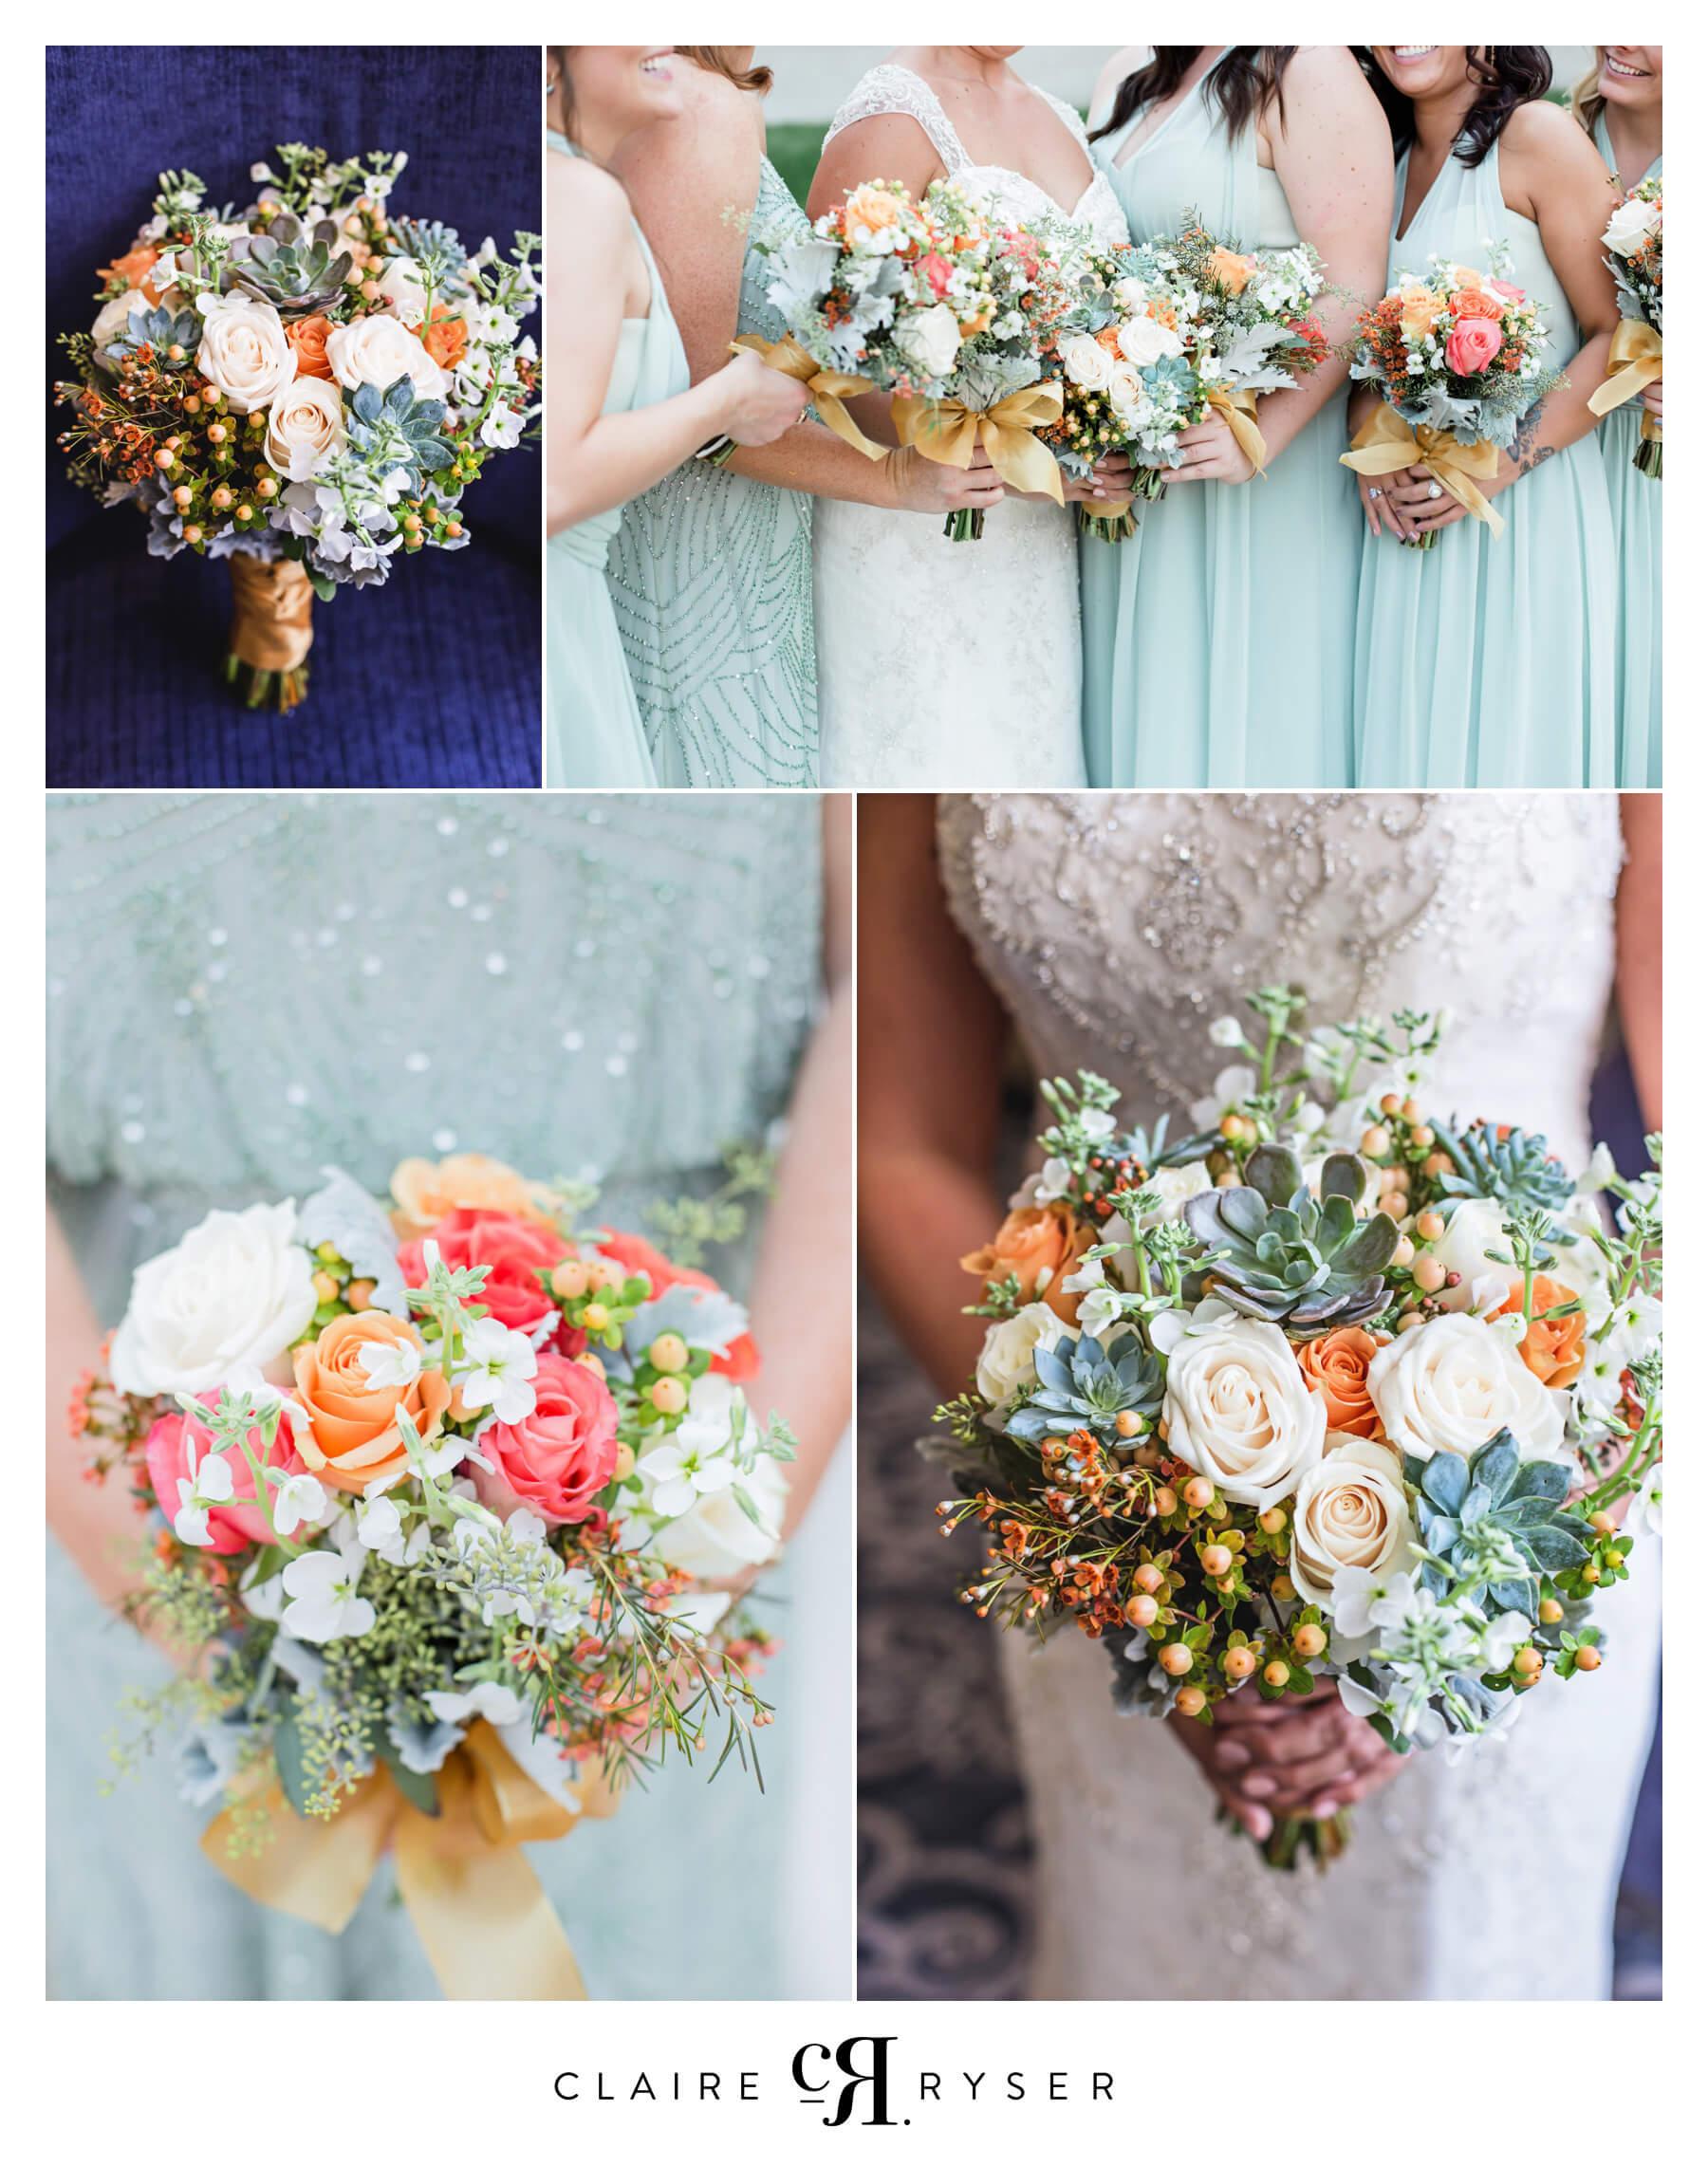 Kansas-City-Wedding-Photography-of-Wedding-Bouquet-Ideas-of_2017_ClaireRyser_16.JPG